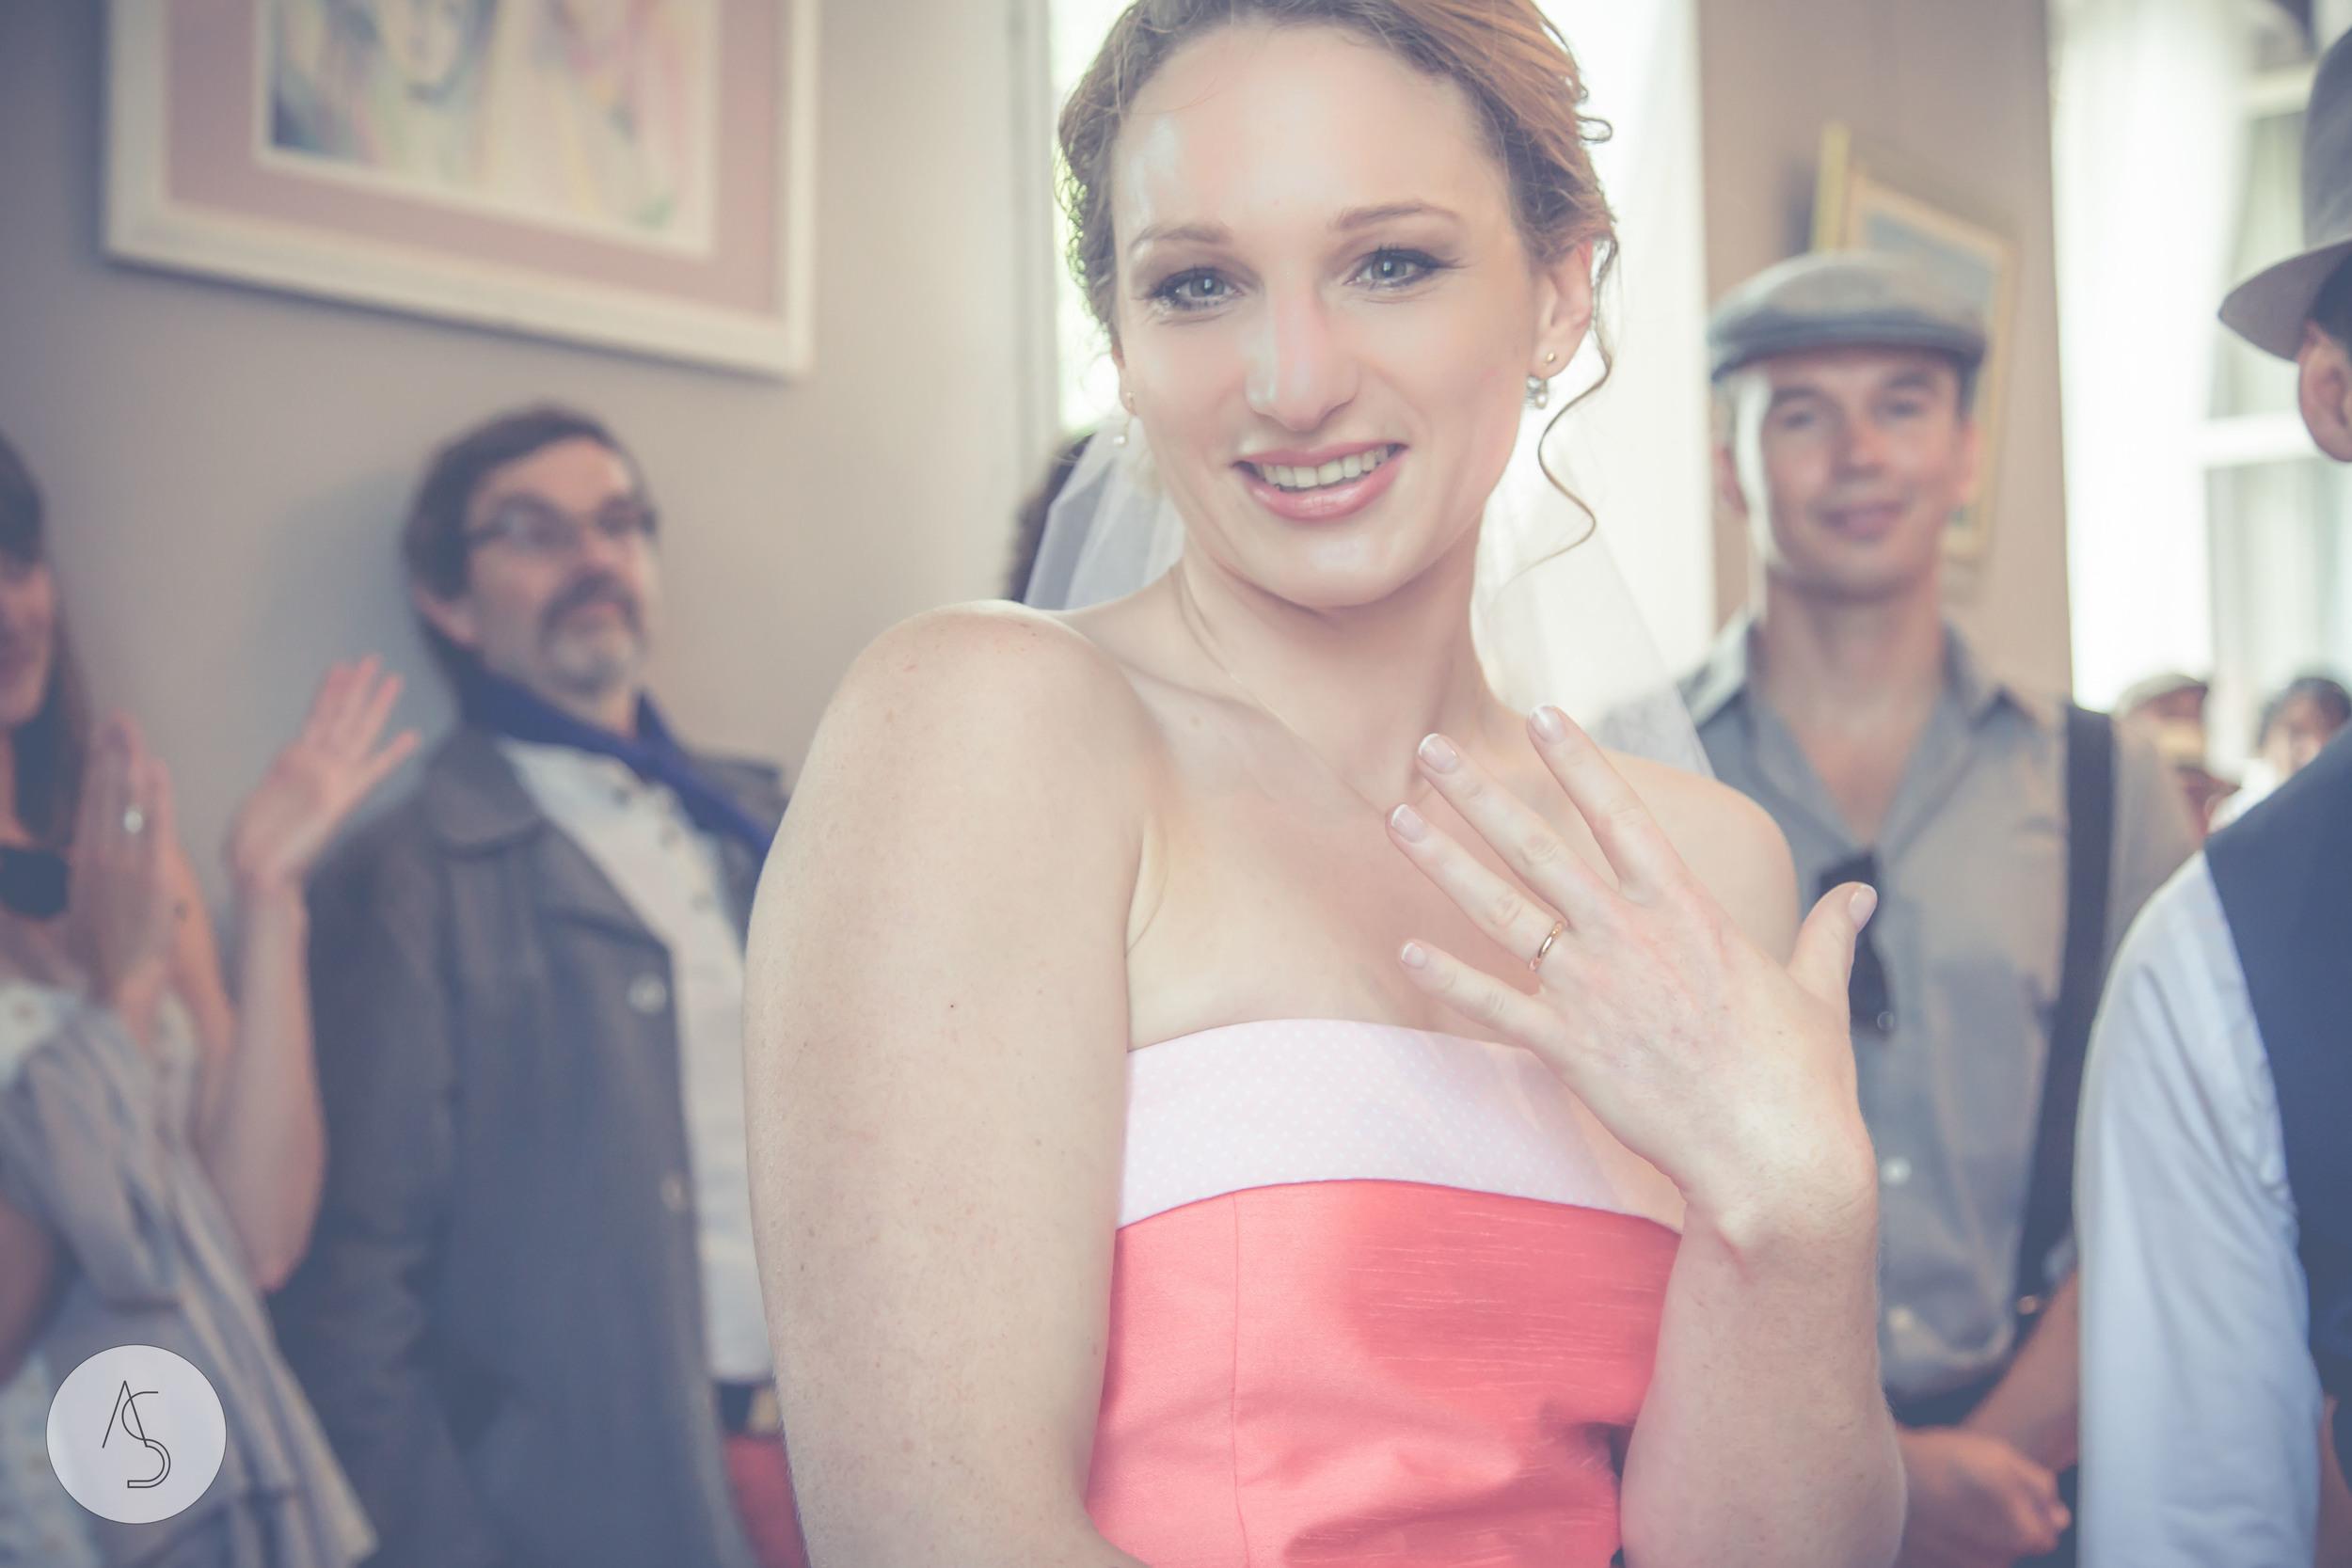 photographe mariage - Grenoble - Rhone Alpes - Adriana Salazar photo-73.jpg